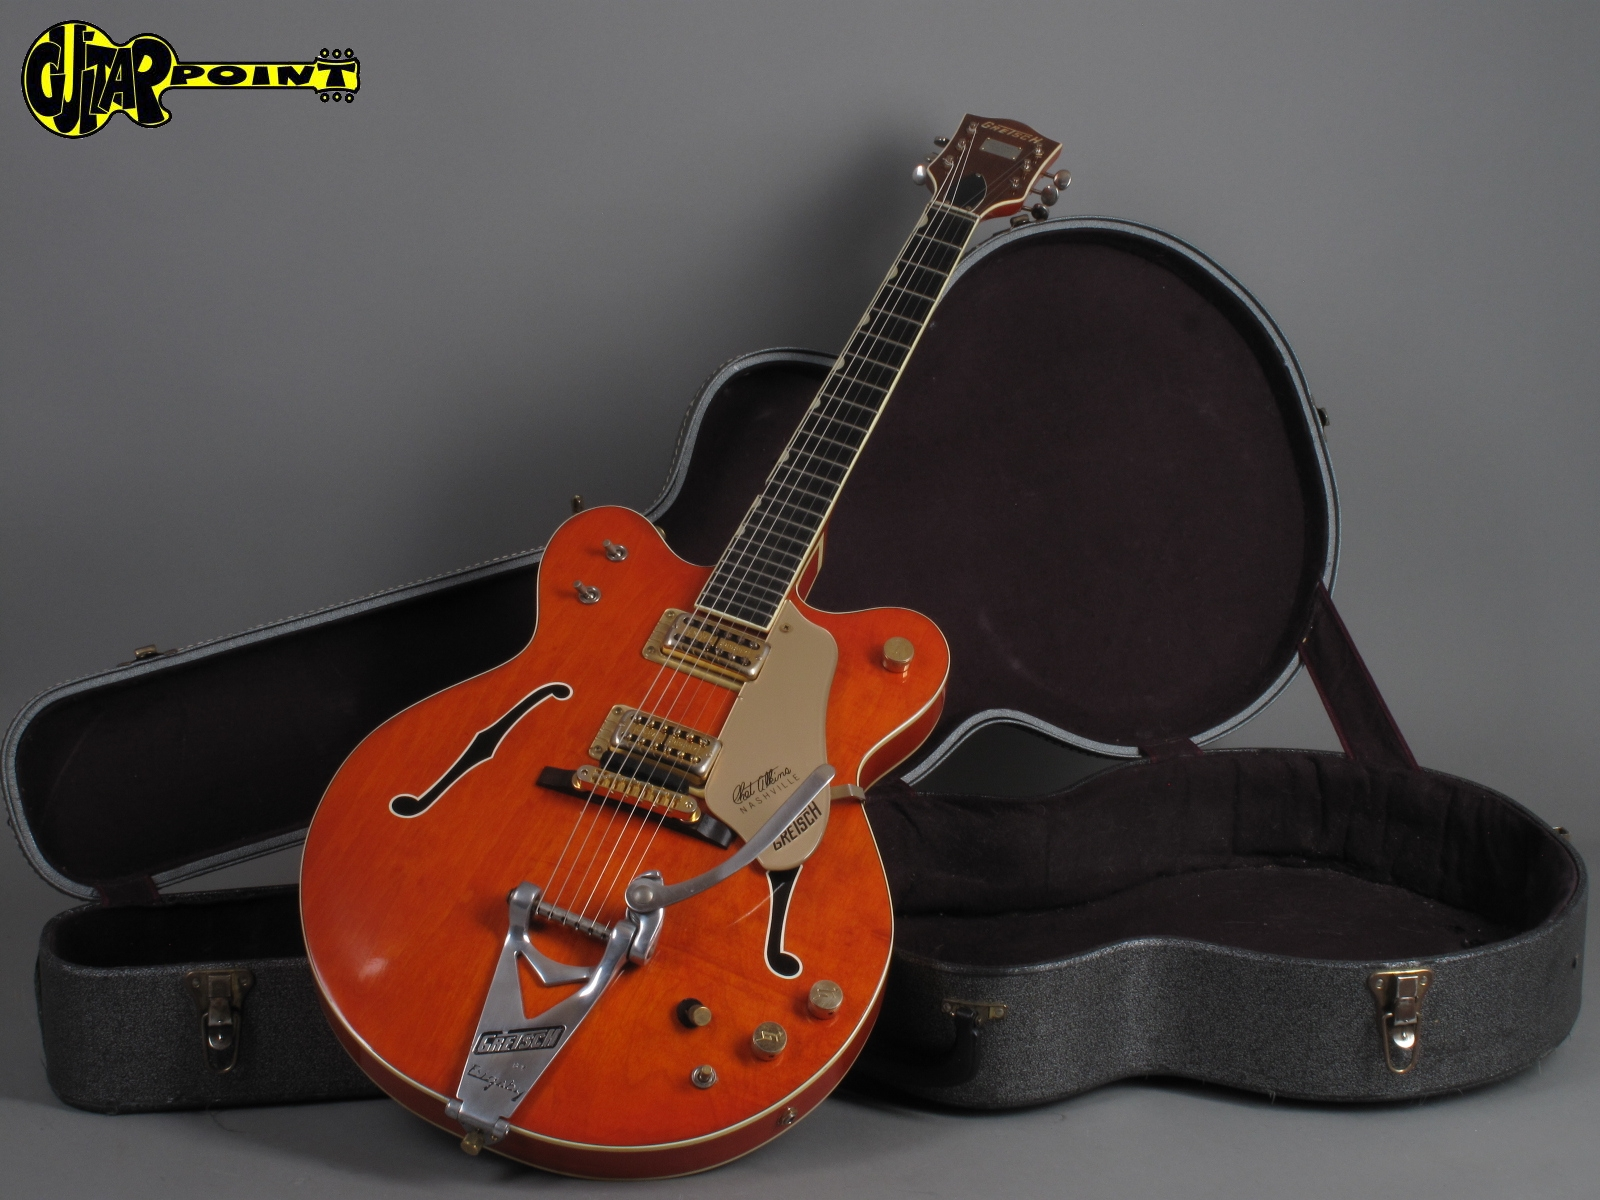 https://guitarpoint.de/app/uploads/products/1966-gretsch-6120-dc-chet-atkins-orange/Gretsch66_6120DC126298_18.jpg